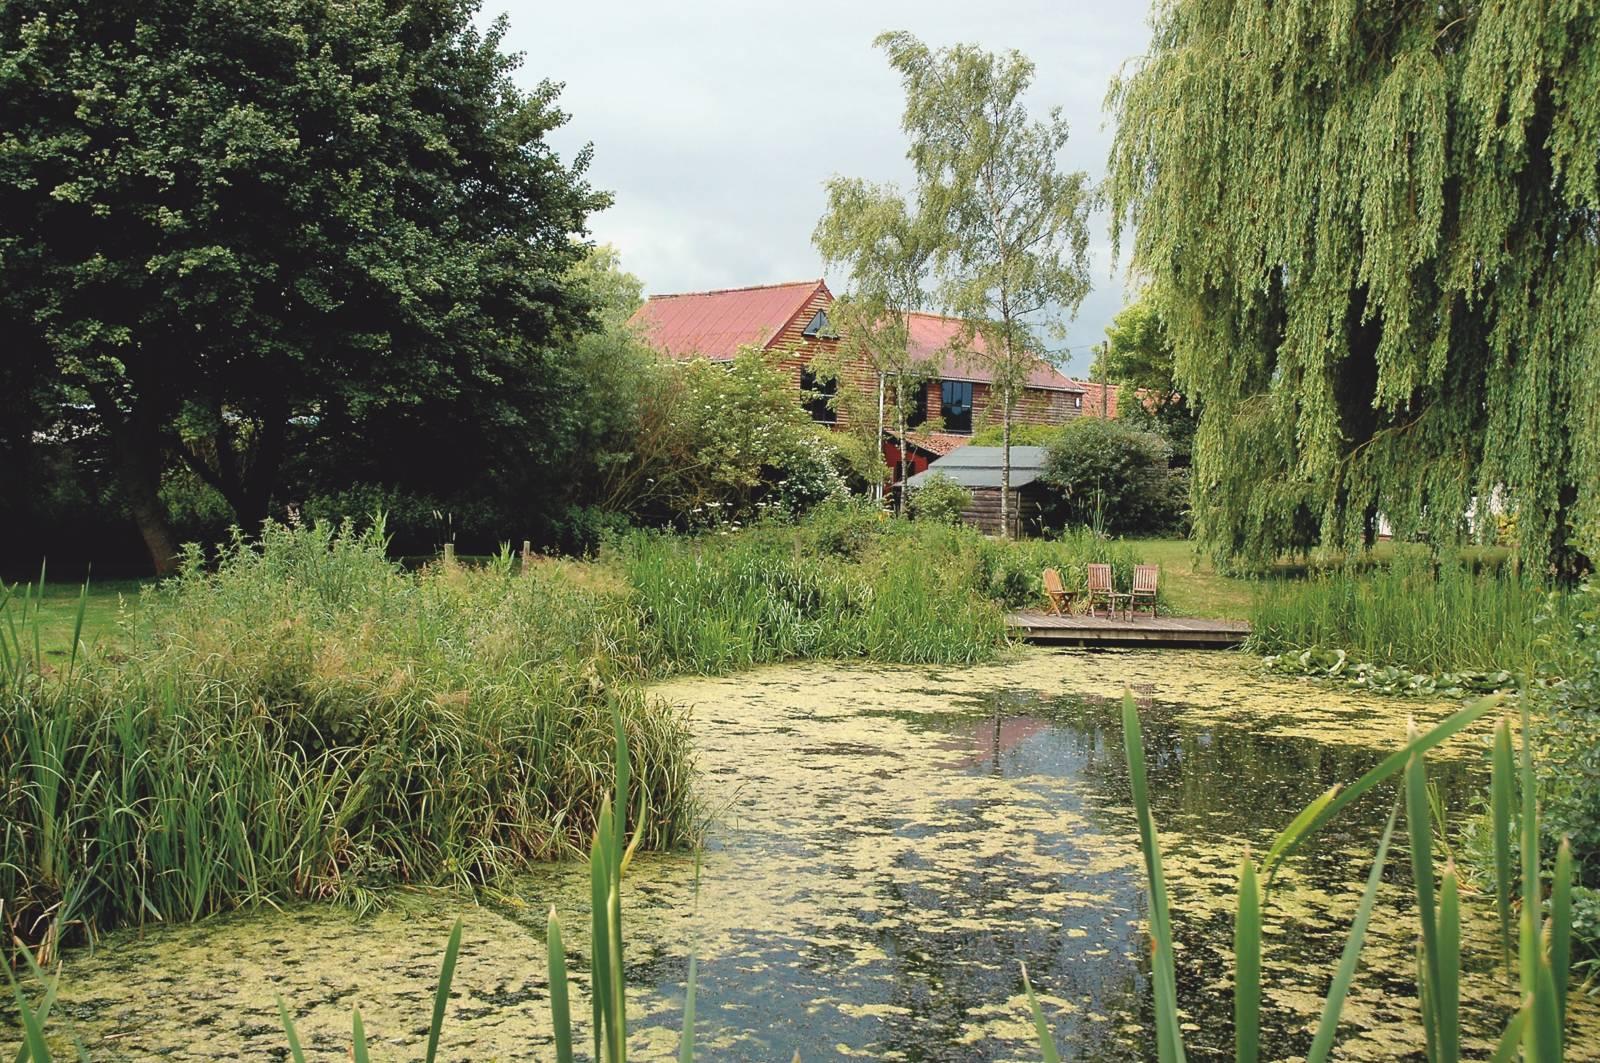 Forncett Steam Museum garden